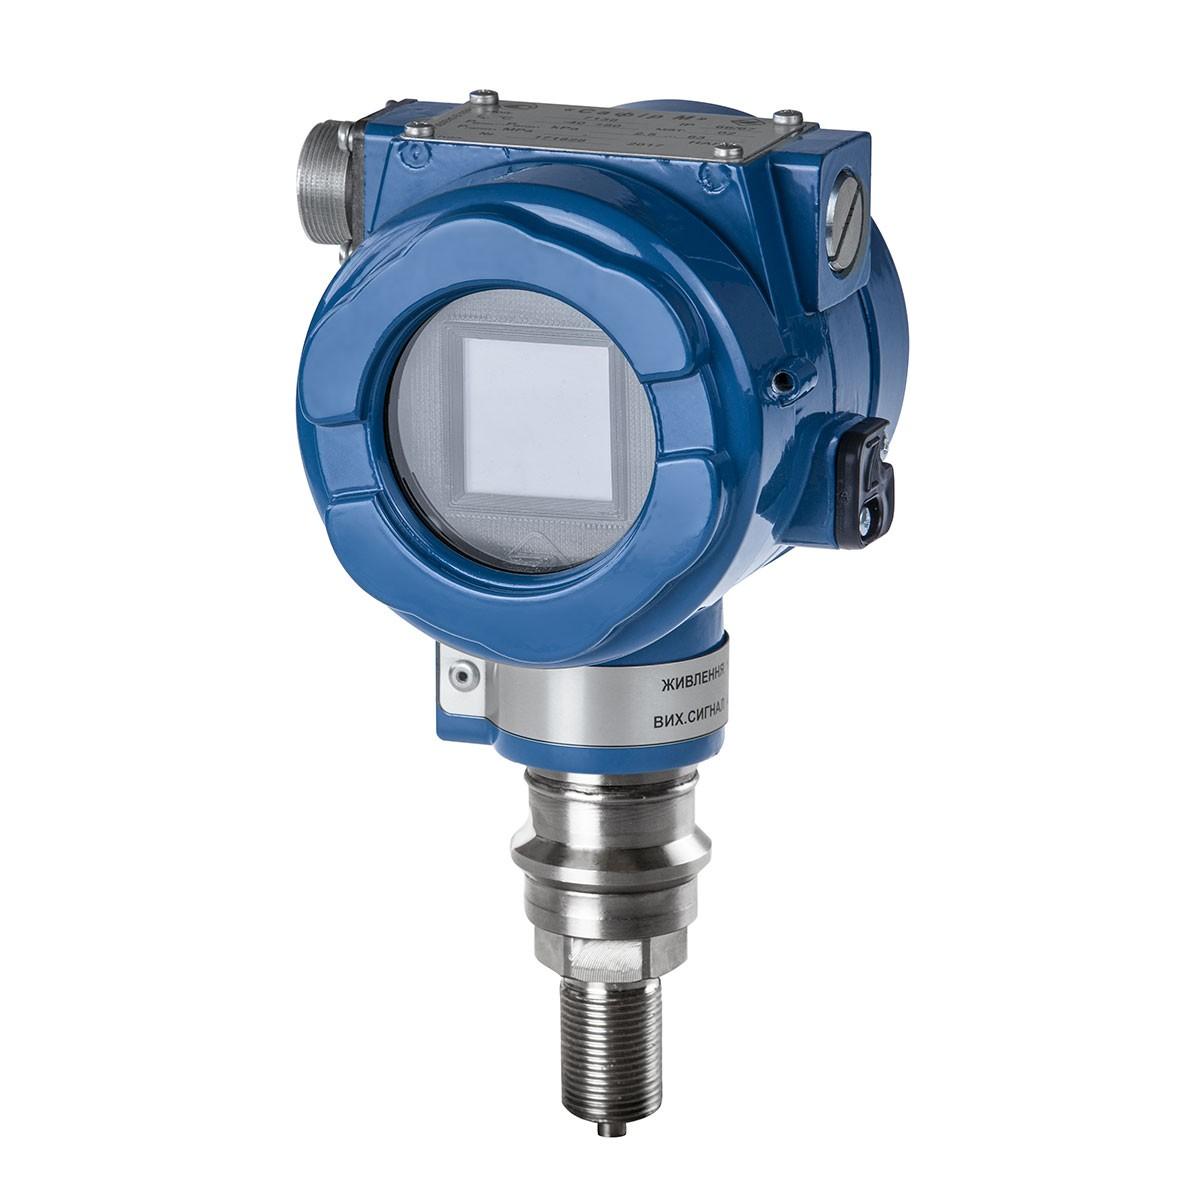 Smart Gauge Pressure Transmitters Safir-M 7130, 7140, 7150, 7160, 7170, 7230, 7240, 7330, 7340, 7350